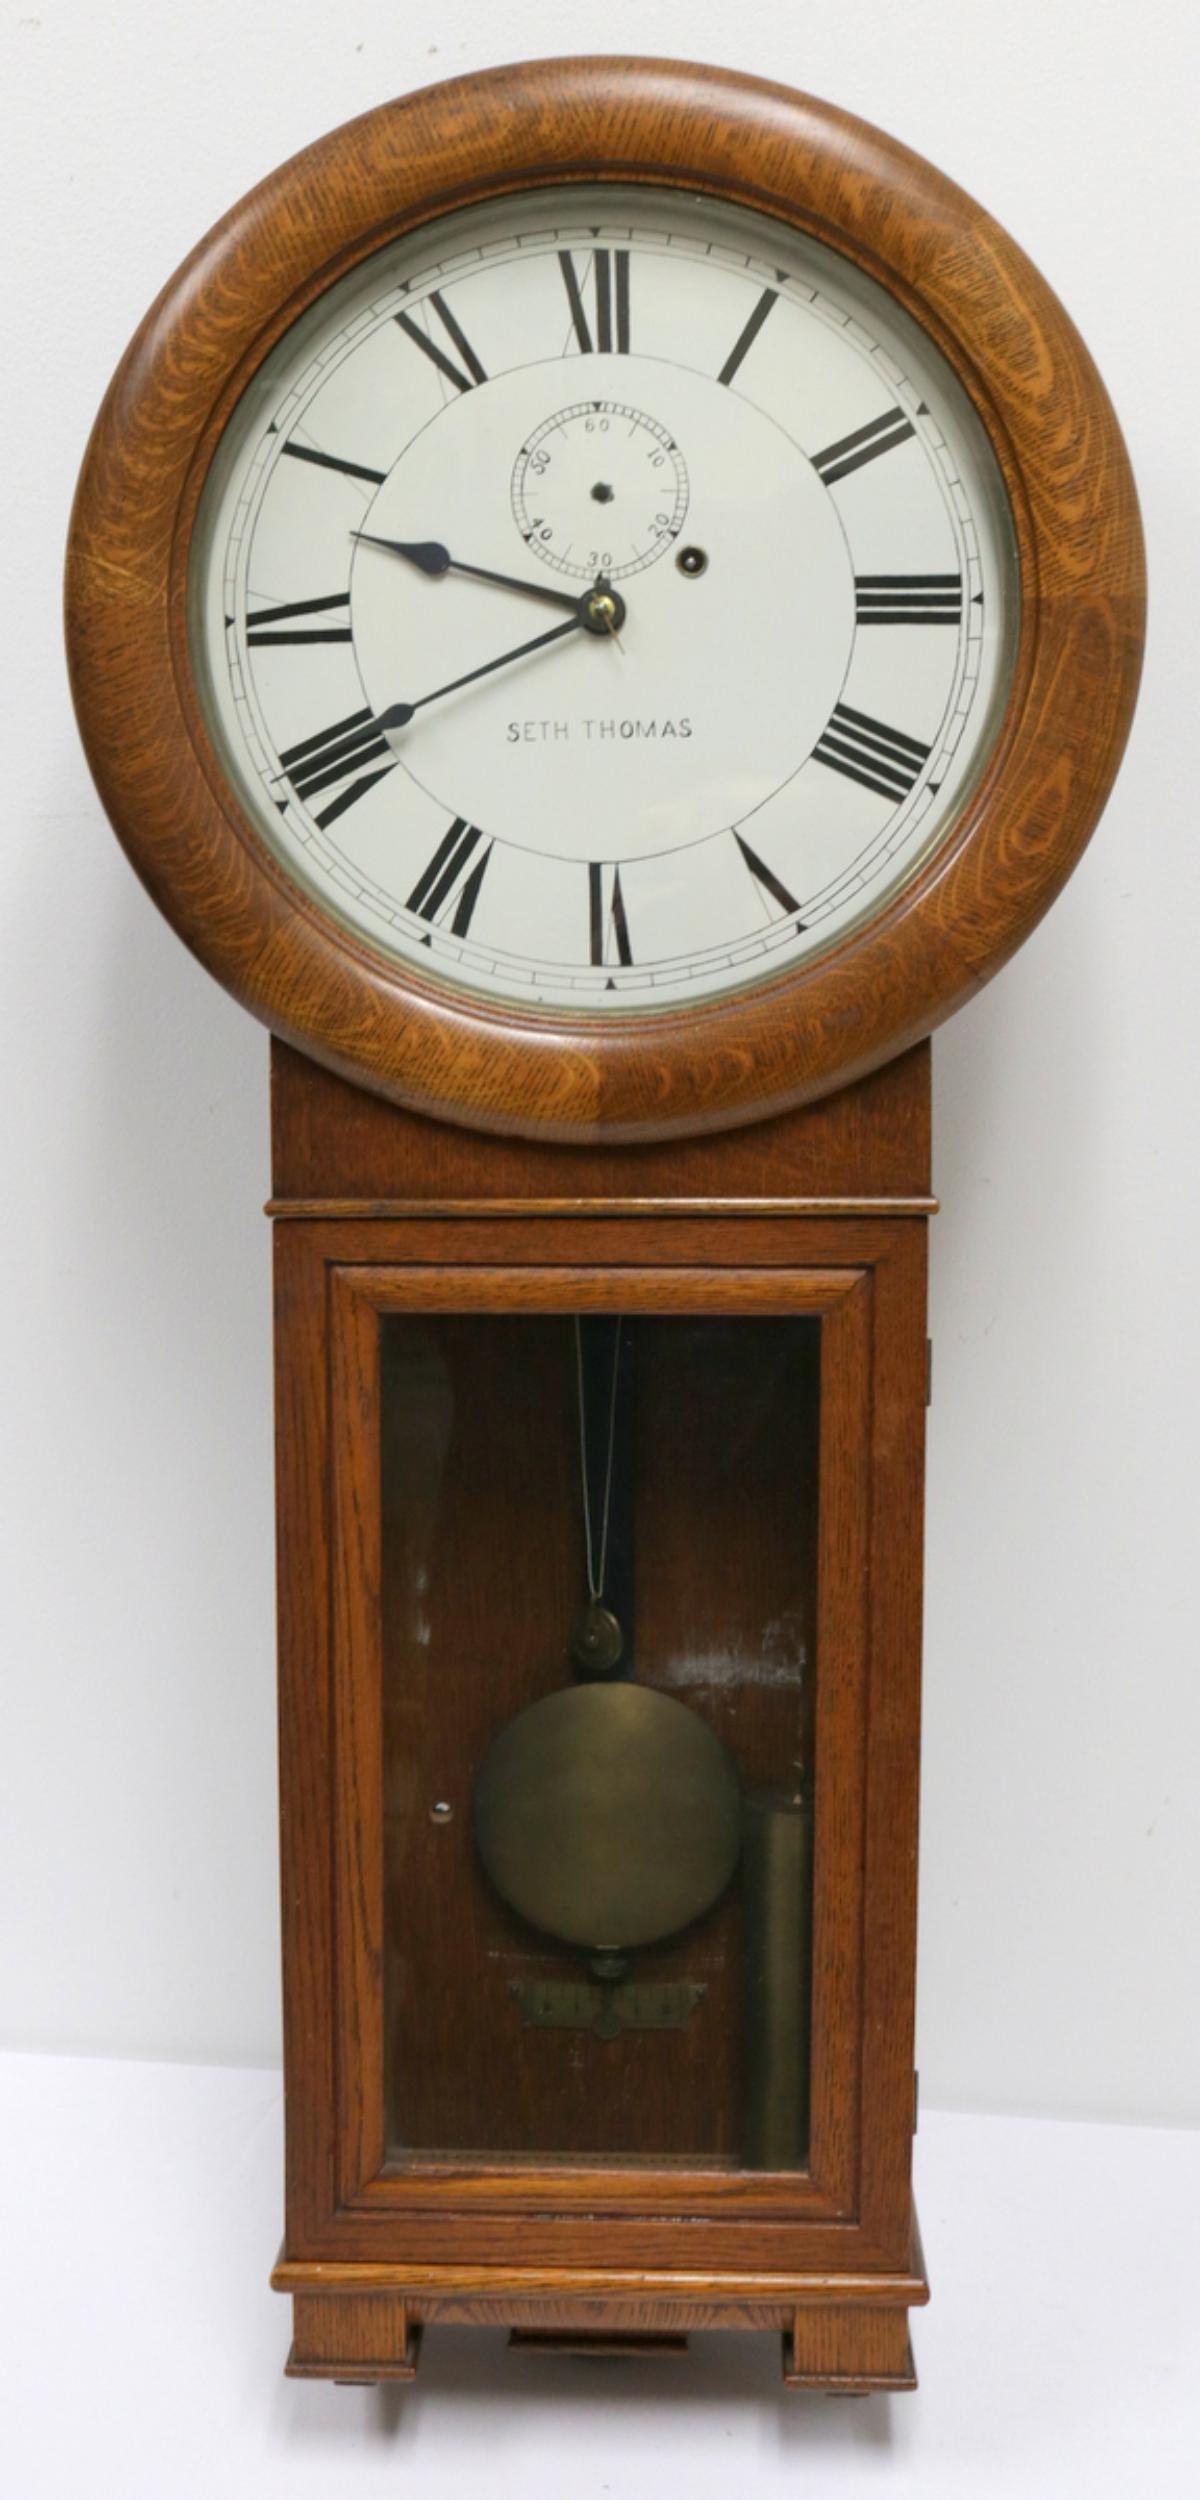 Antique Seth Thomas Wooden Wall Clock